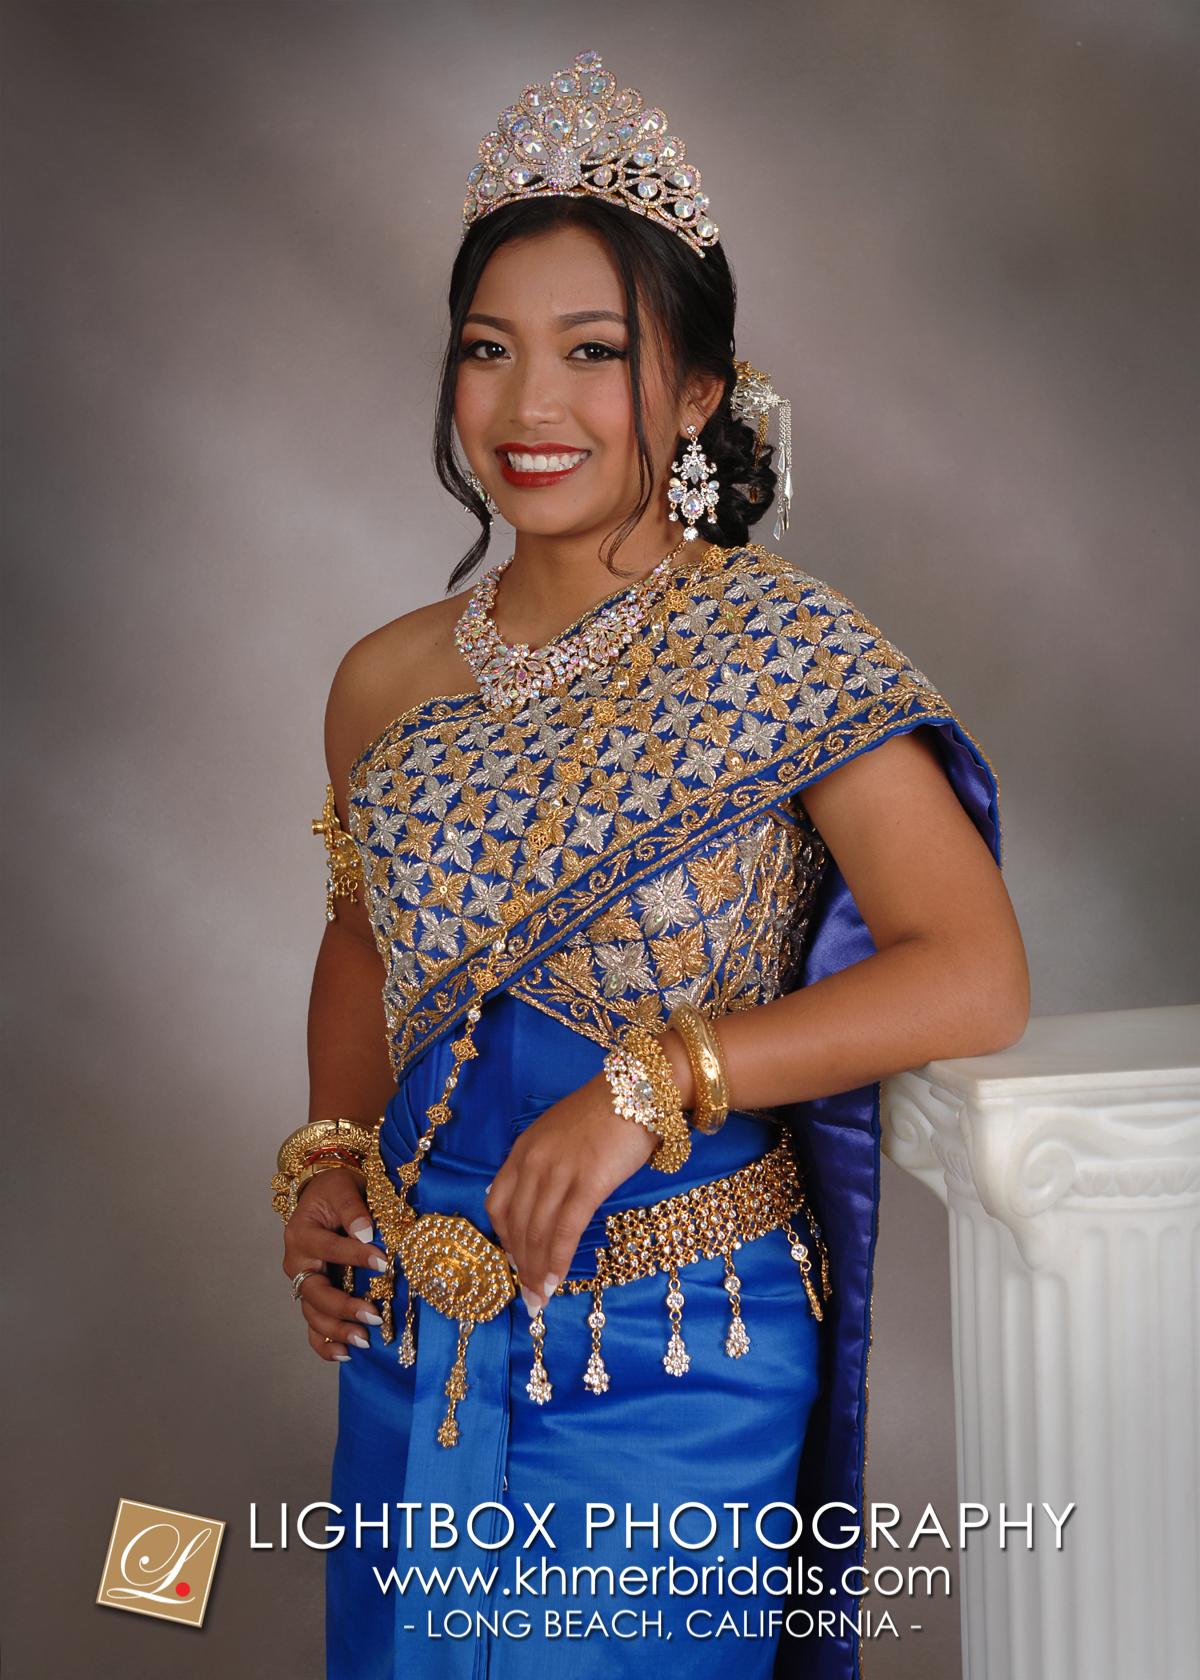 Apsara Khmer Bridal Wedding Photography and video-208.jpg